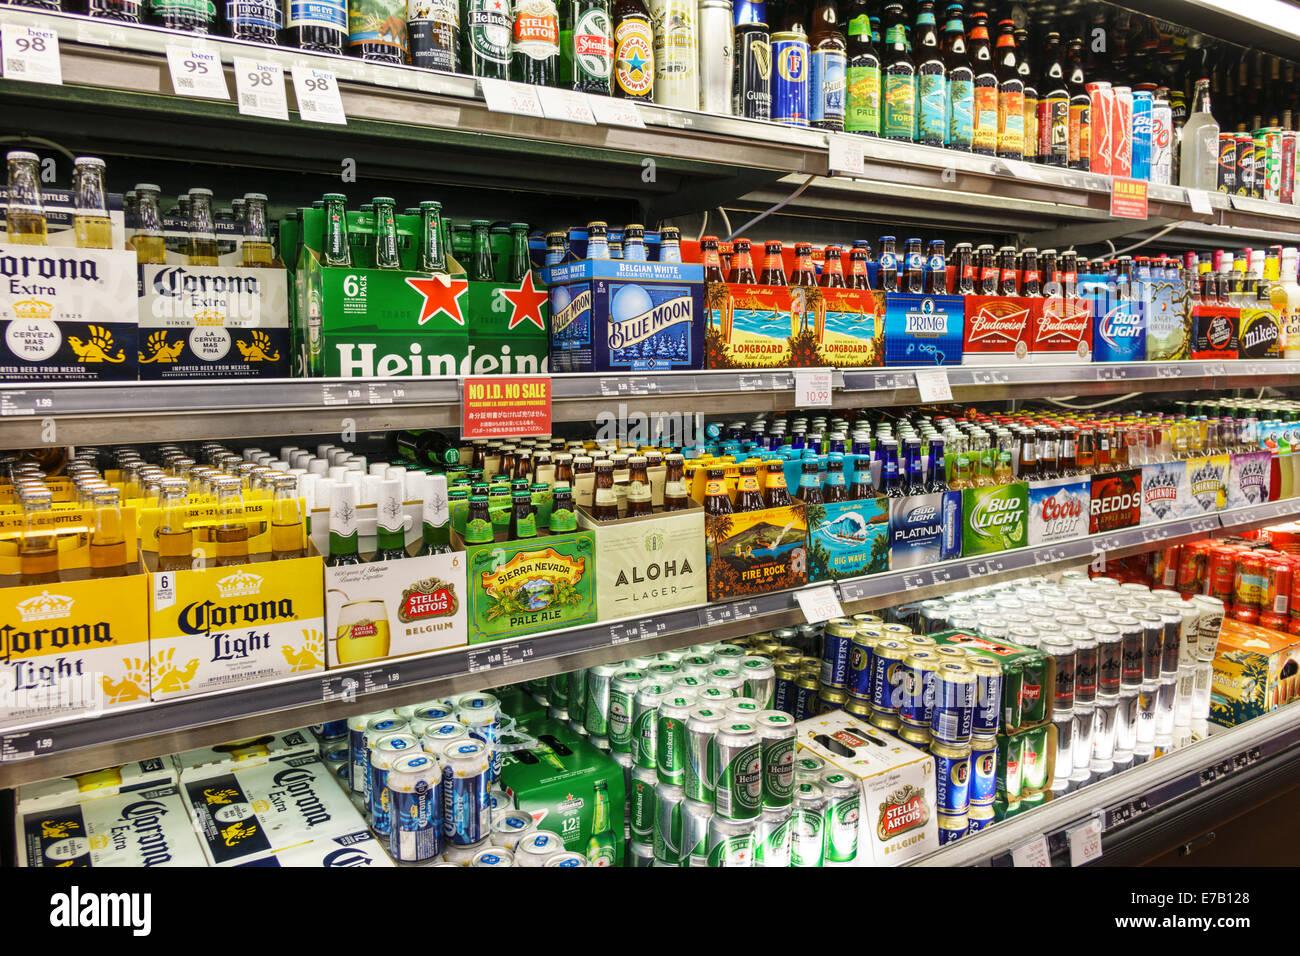 https://c8.alamy.com/compfr/e7b128/hawaii-honolulu-hawai-waikiki-beach-magasins-abc-a-linterieur-de-laffichage-interieur-vente-de-bouteilles-de-boissons-alcoolisees-biere-6-packs-heineken-light-corona-e7b128.jpg